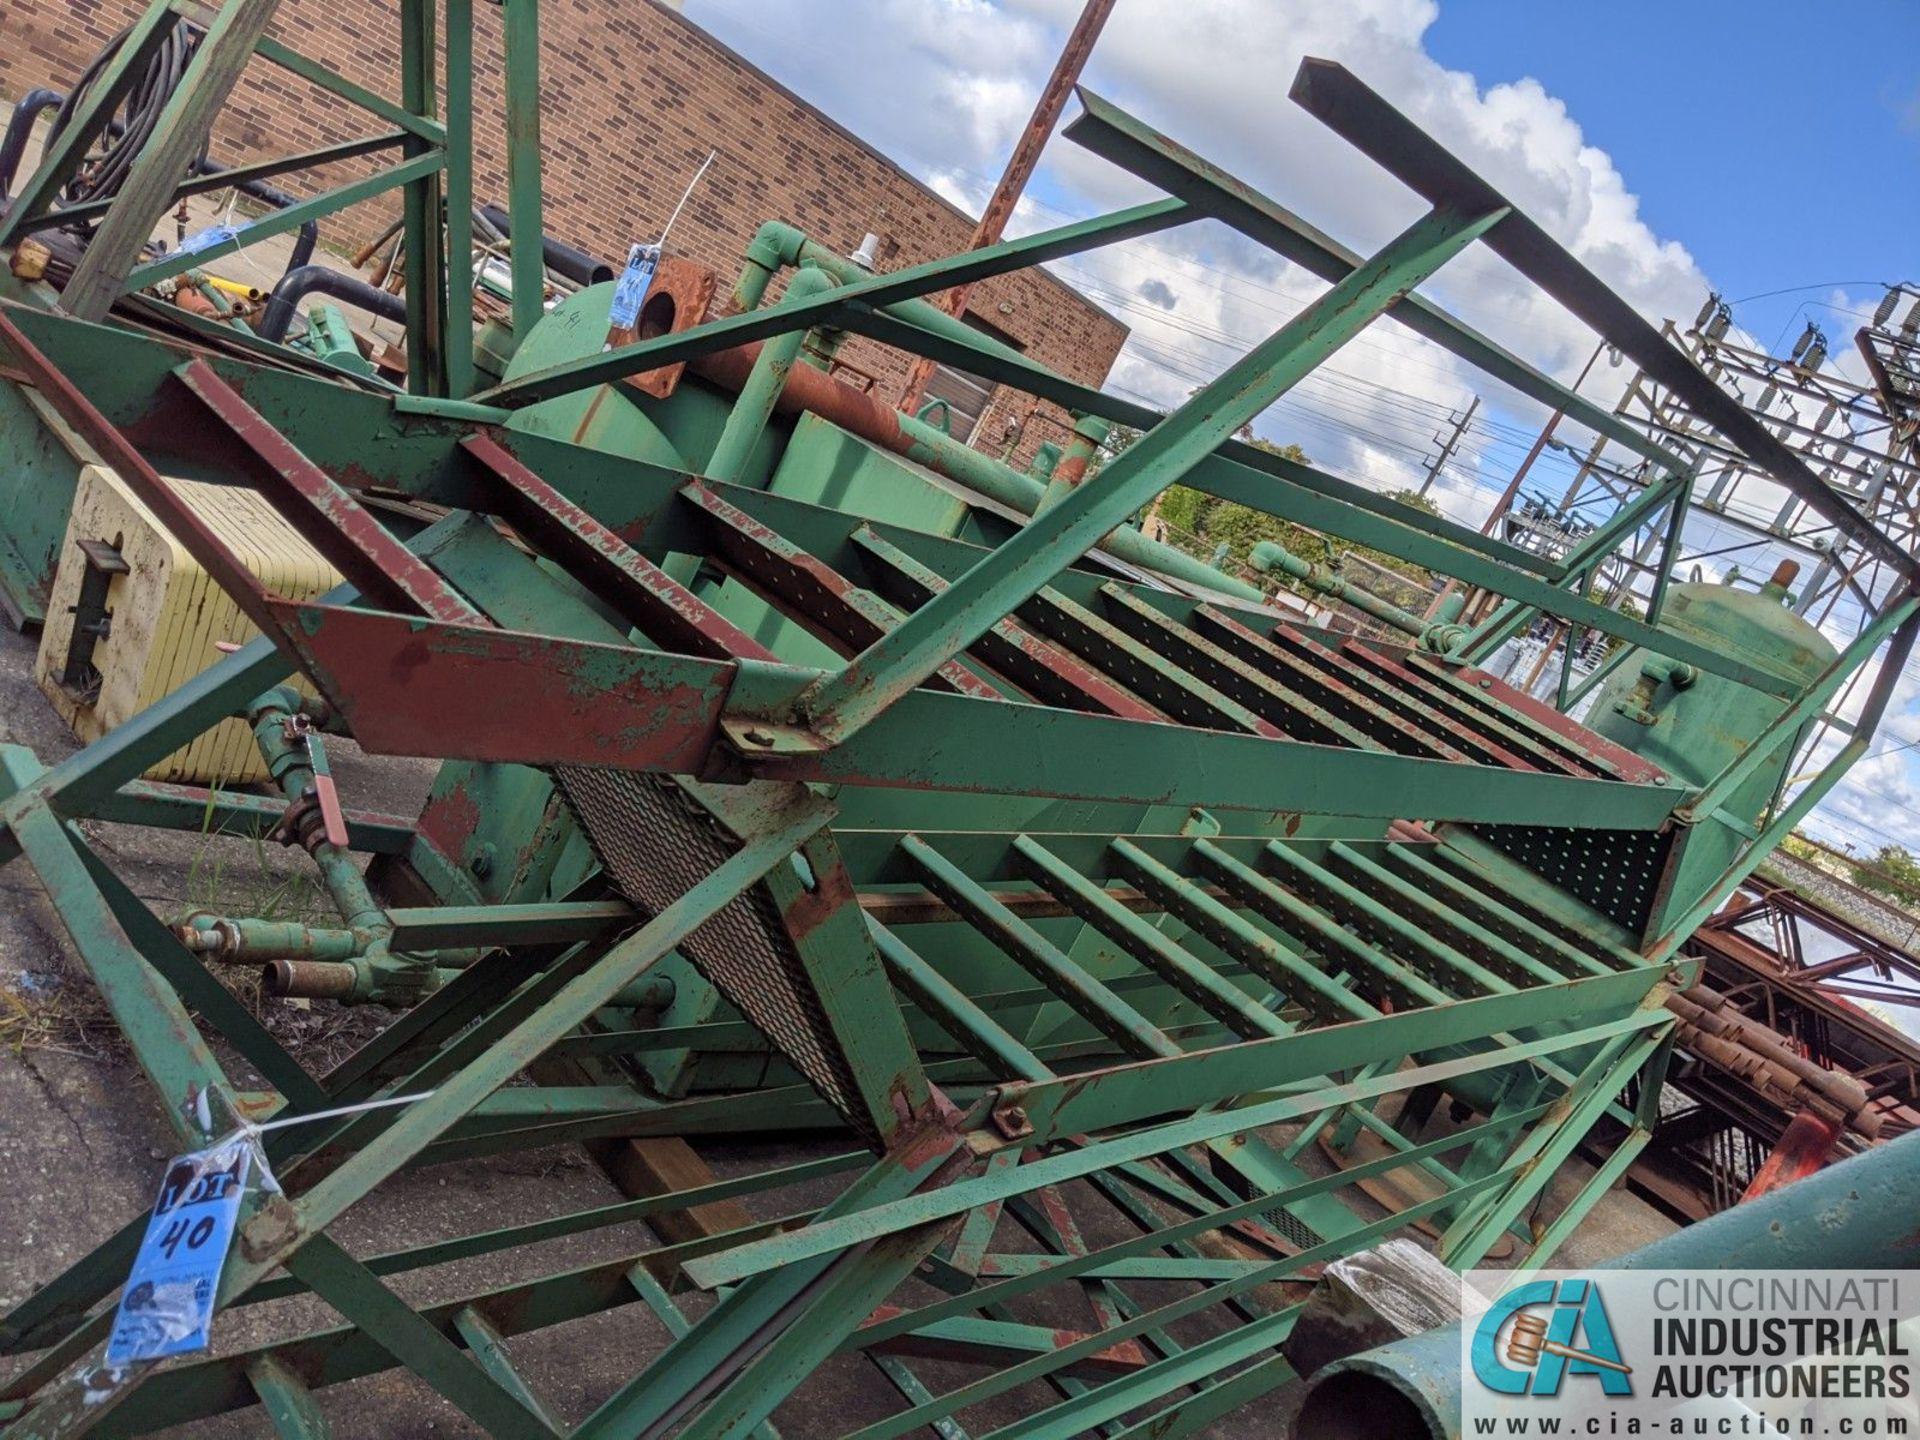 (LOT) STEEL FRAME STEPS; APPROX. 10' LONG (8635 East Ave., Mentor, OH 44060 - John Magnasum: 440- - Image 2 of 2